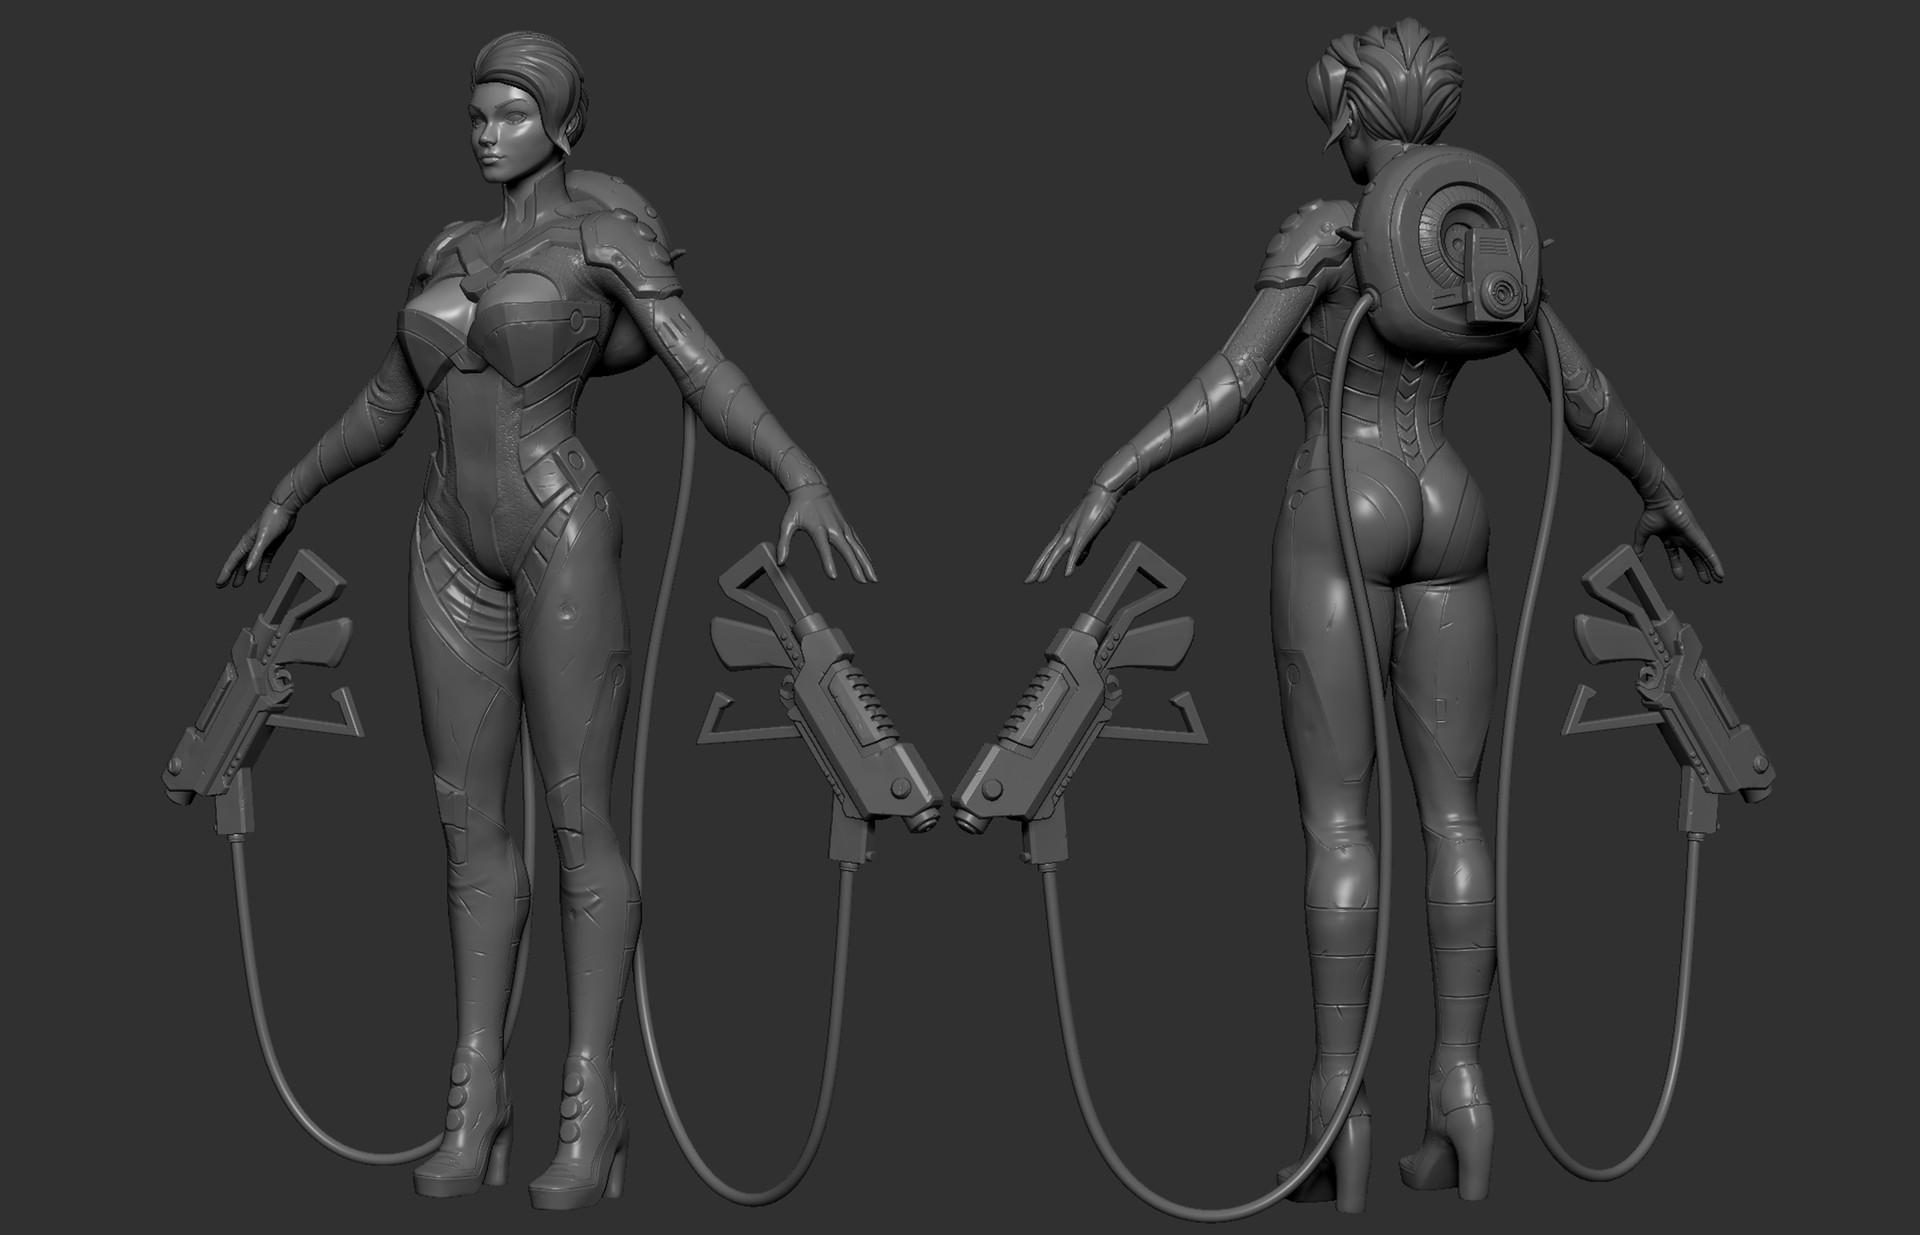 Eren ozel cinder scifi costume design 35 161207